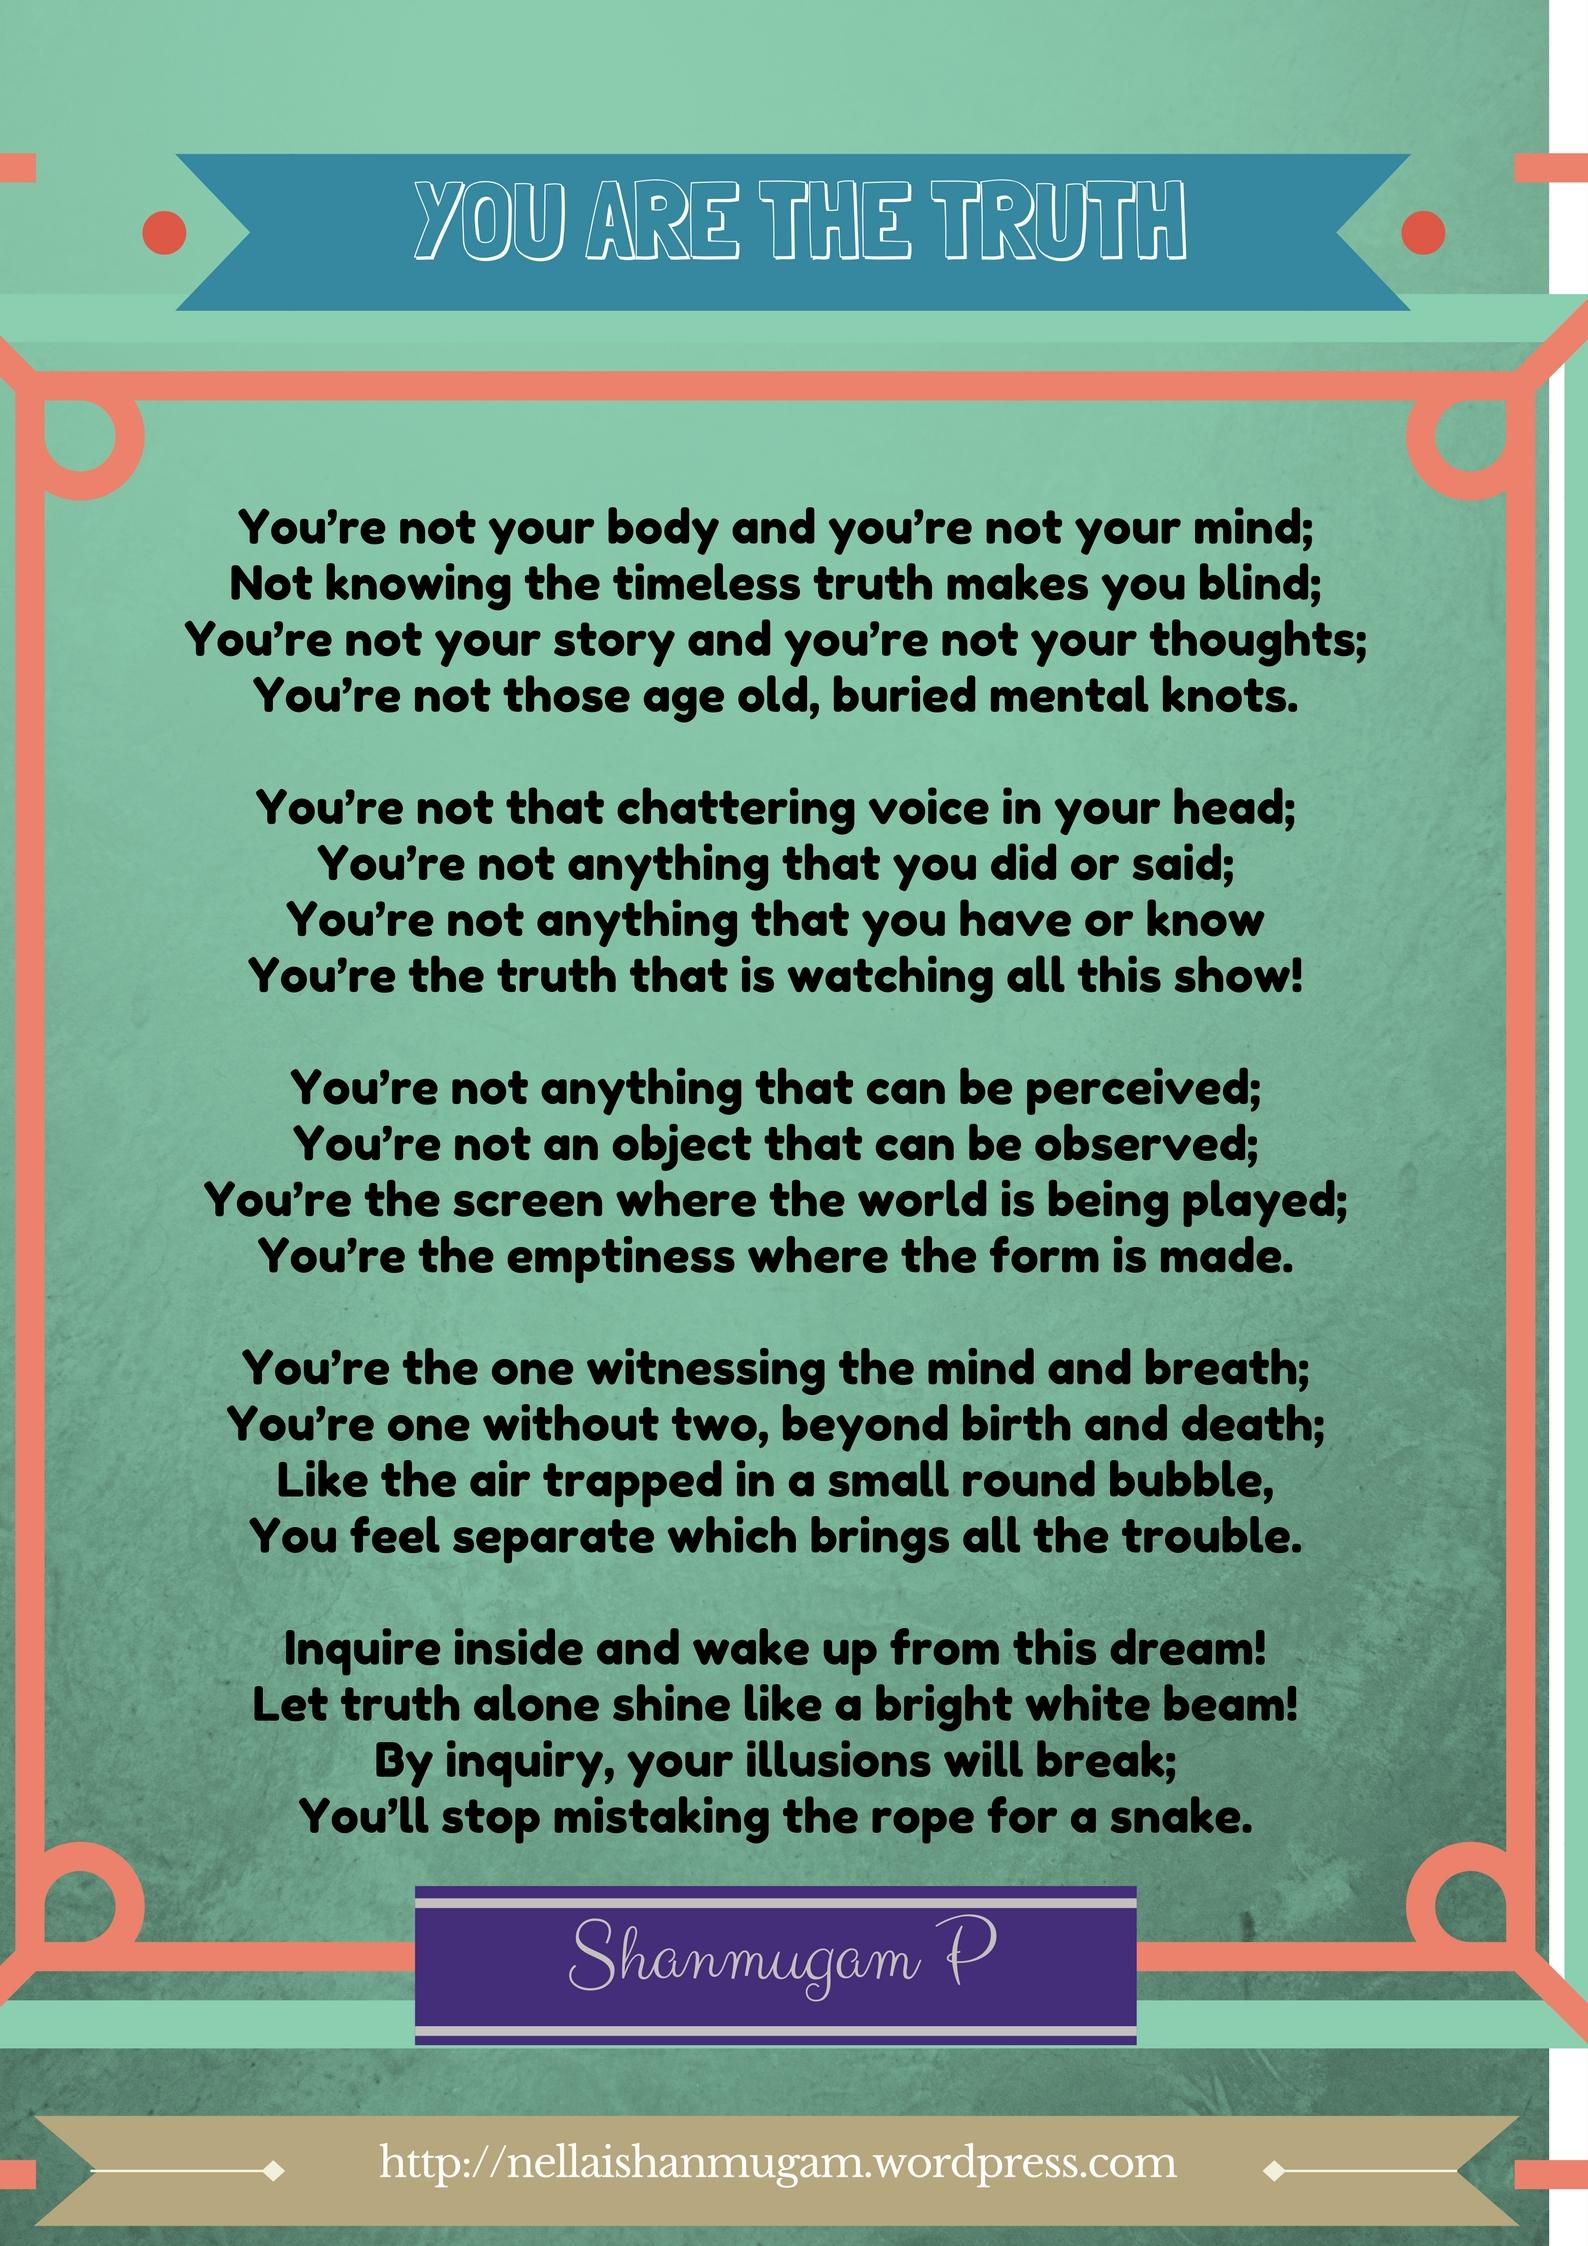 You are the Truth - The Essential Wisdom of Advaita